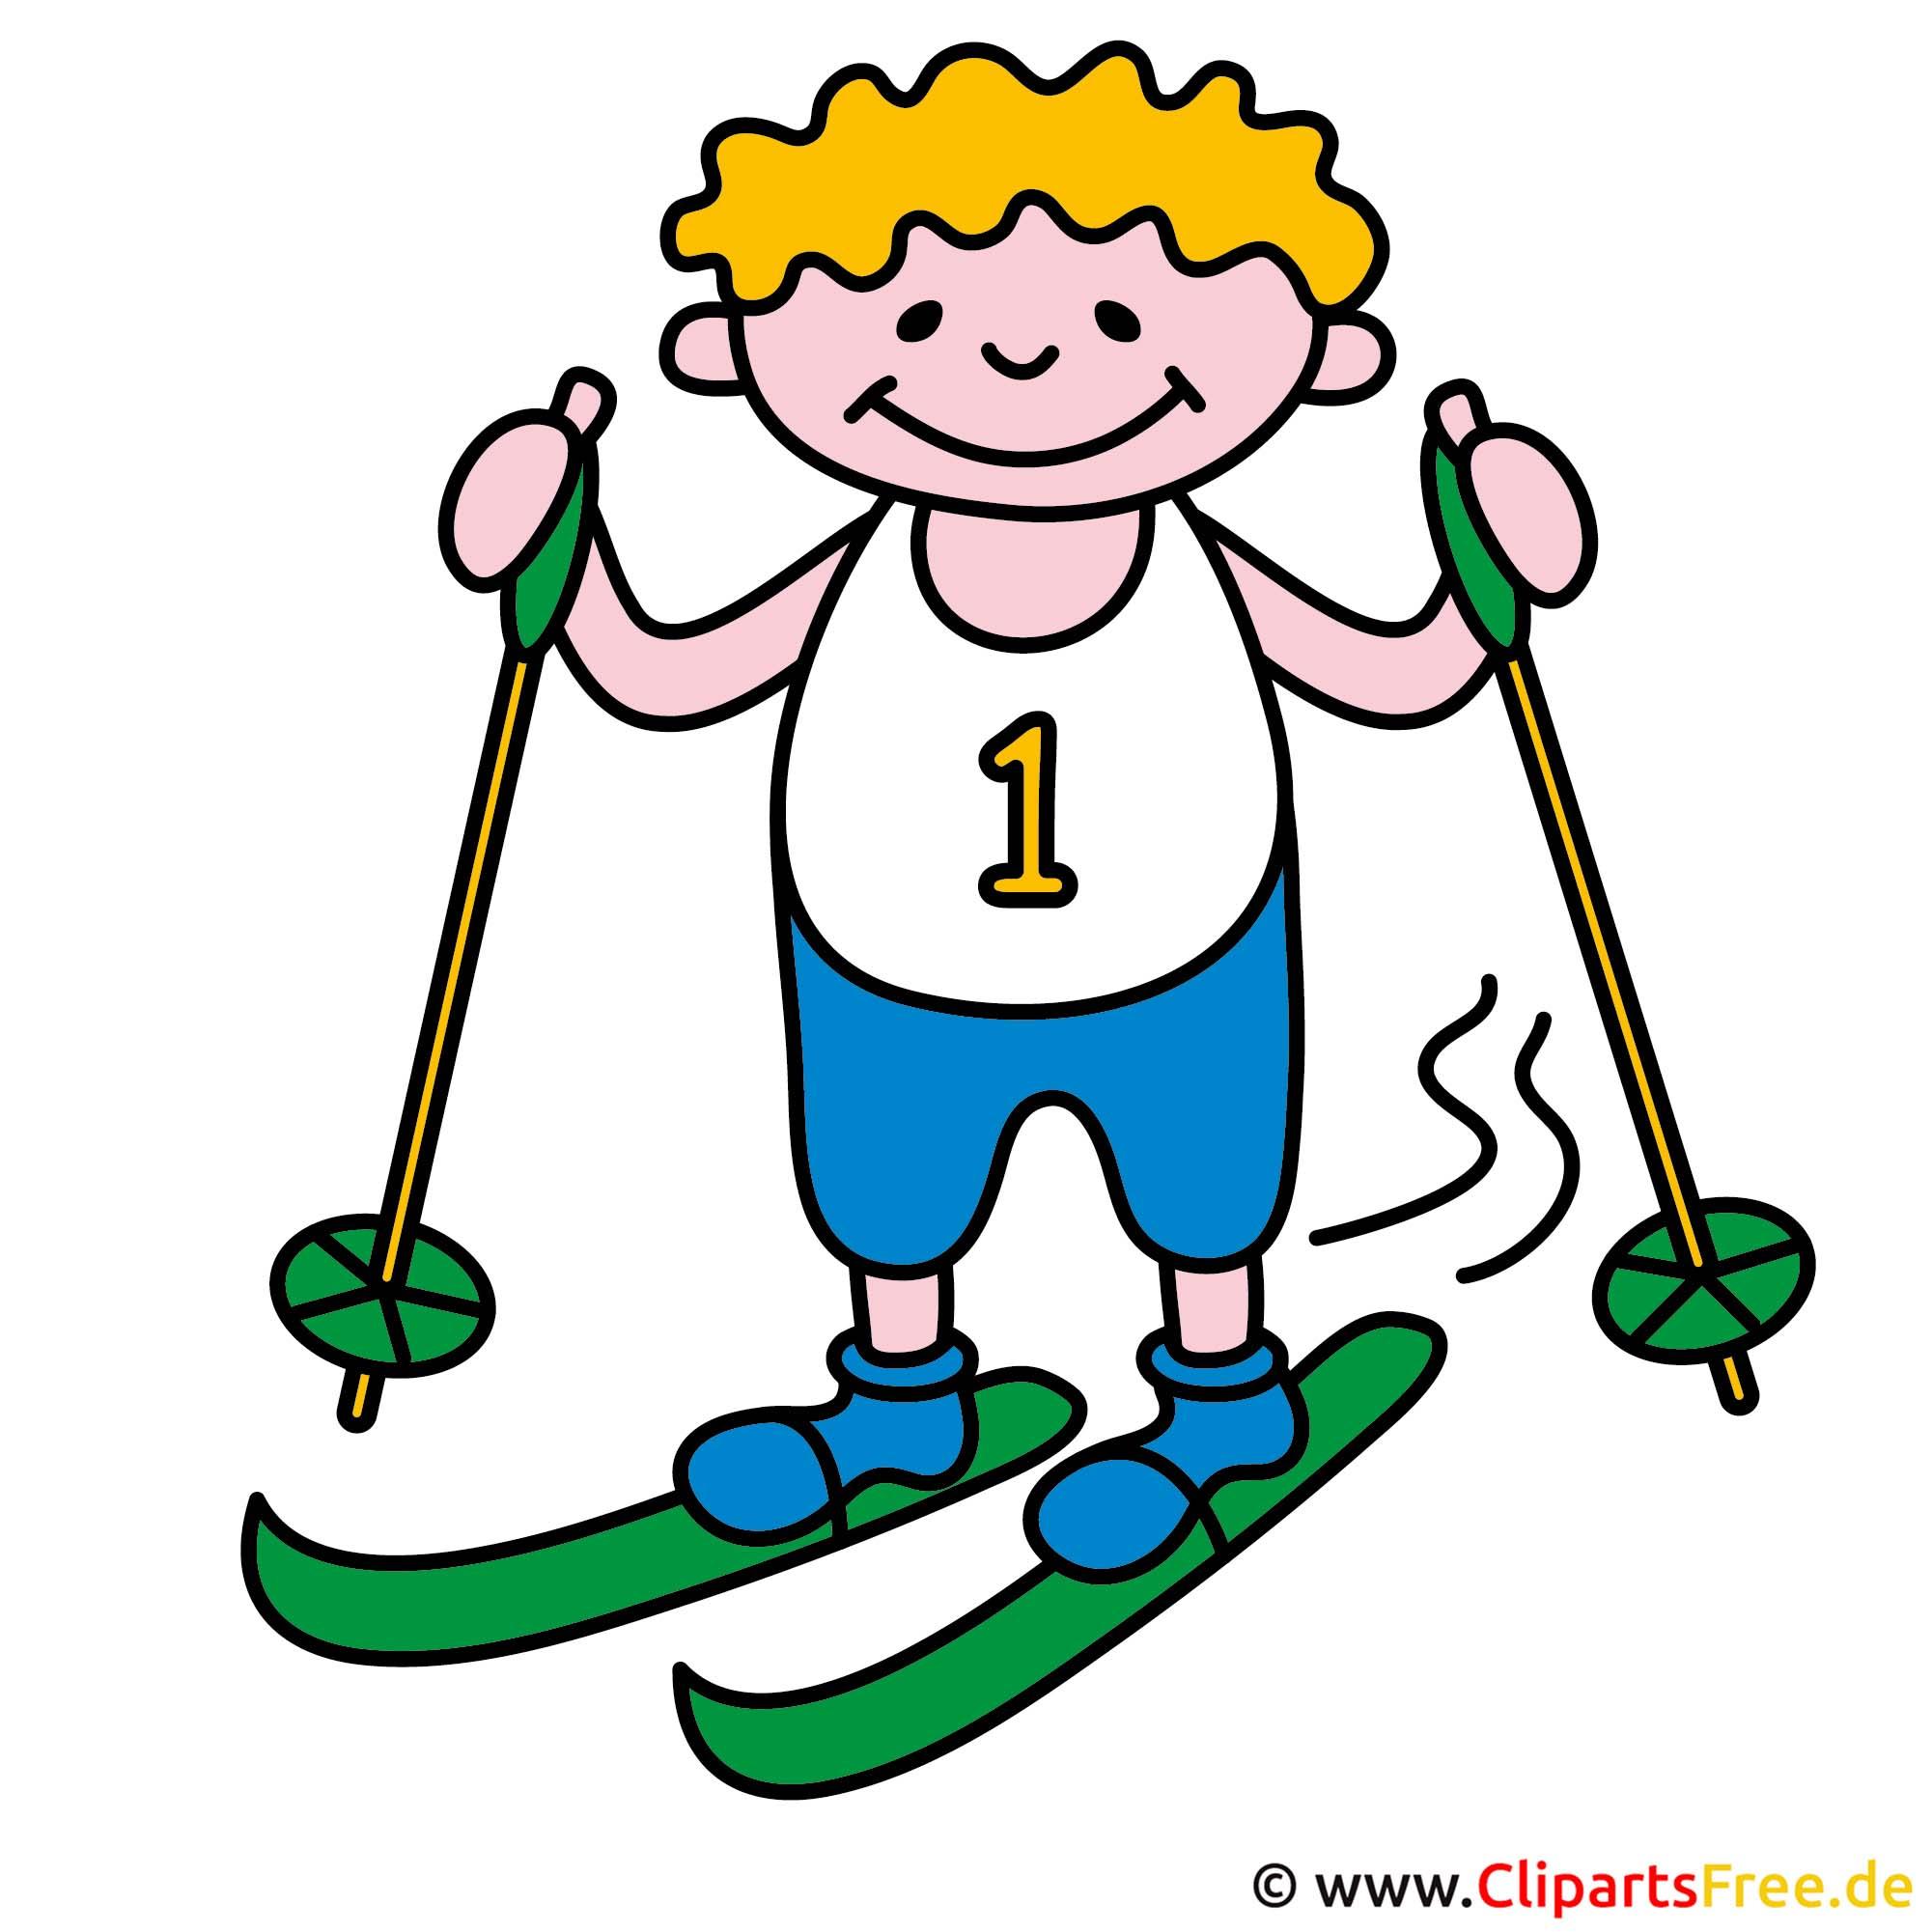 ski clip art free rh clipartsfree de clipart gratis microsoft clipart gratis natale